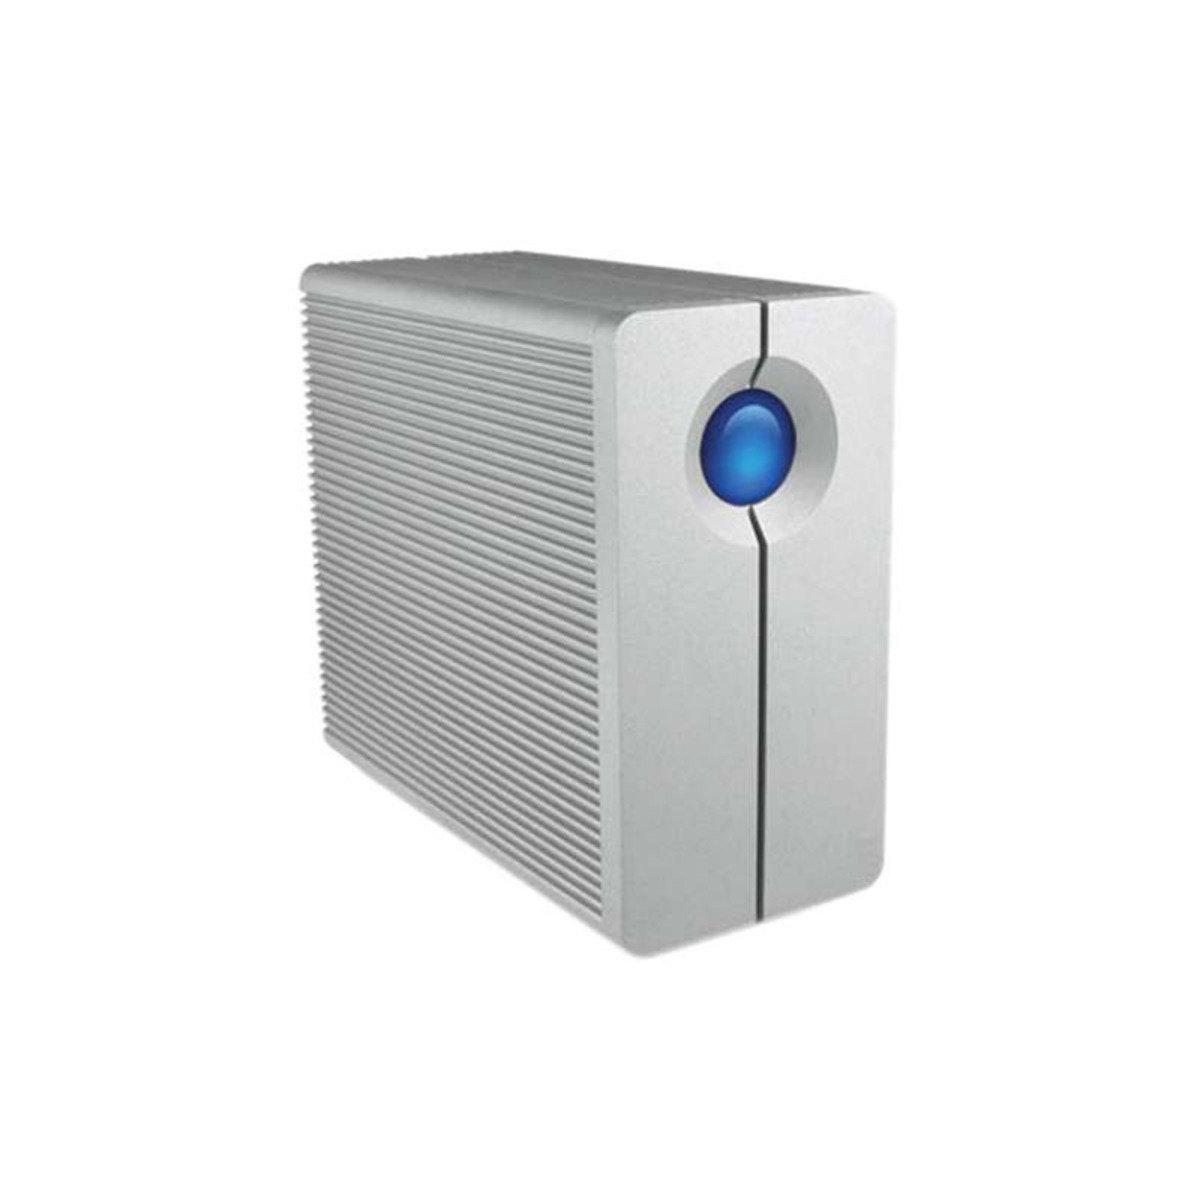 2big Quadra USB3.0 8TB 3.5吋 雙硬碟RAID外置硬碟 9000317